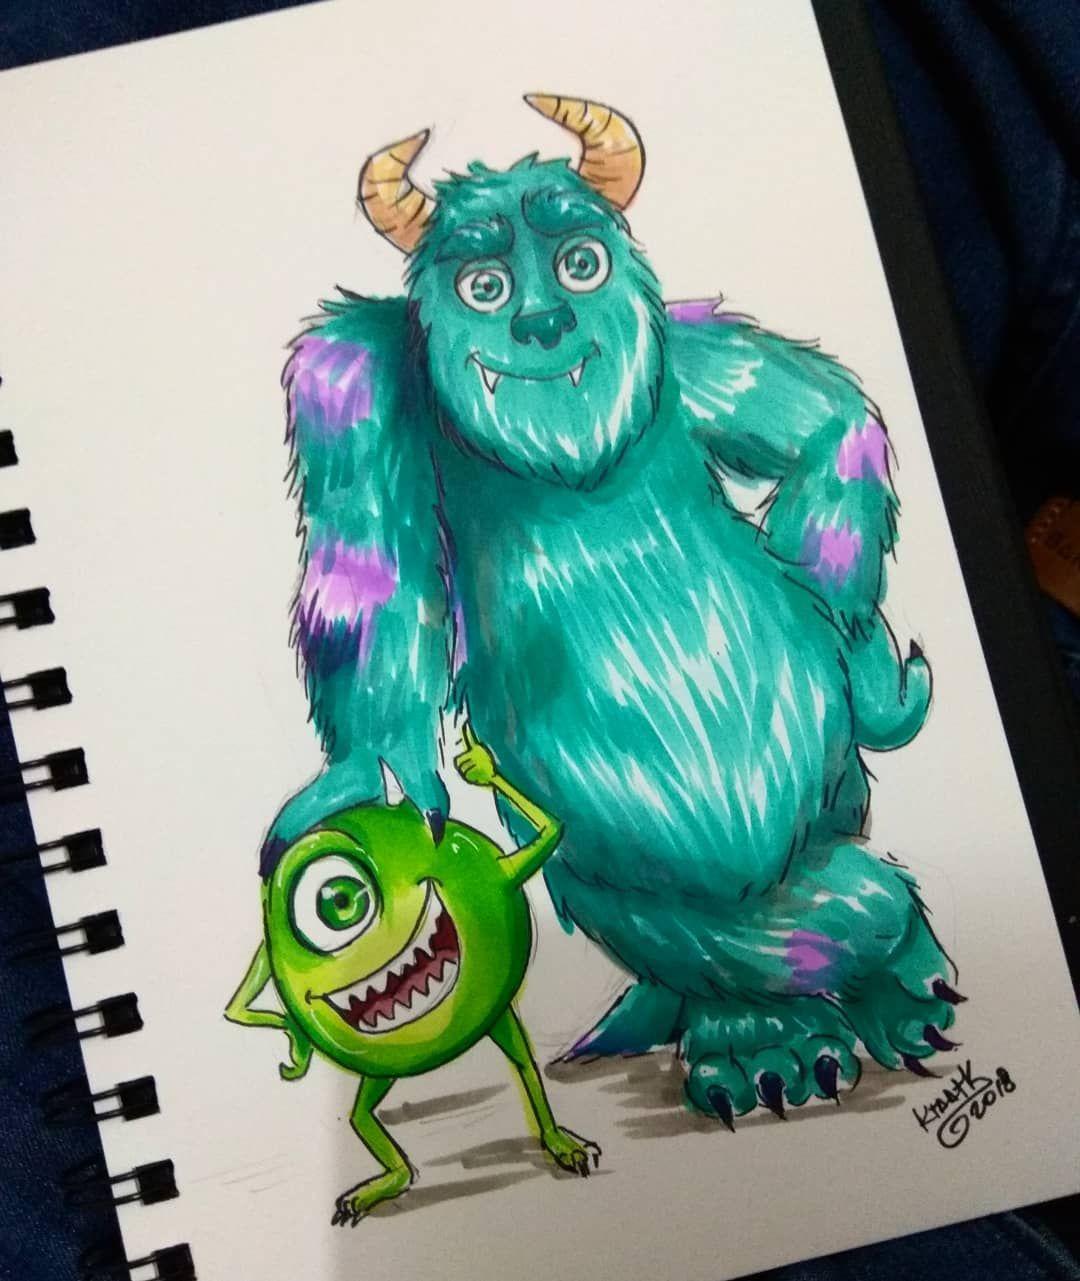 Day 18 Monster Inc Sully Sullivan Monster Monsterinc Disney Pixar Drawingchallenge Mike Mikewazowski Doodletimewithkaroli Dibujos Ilustraciones Arte